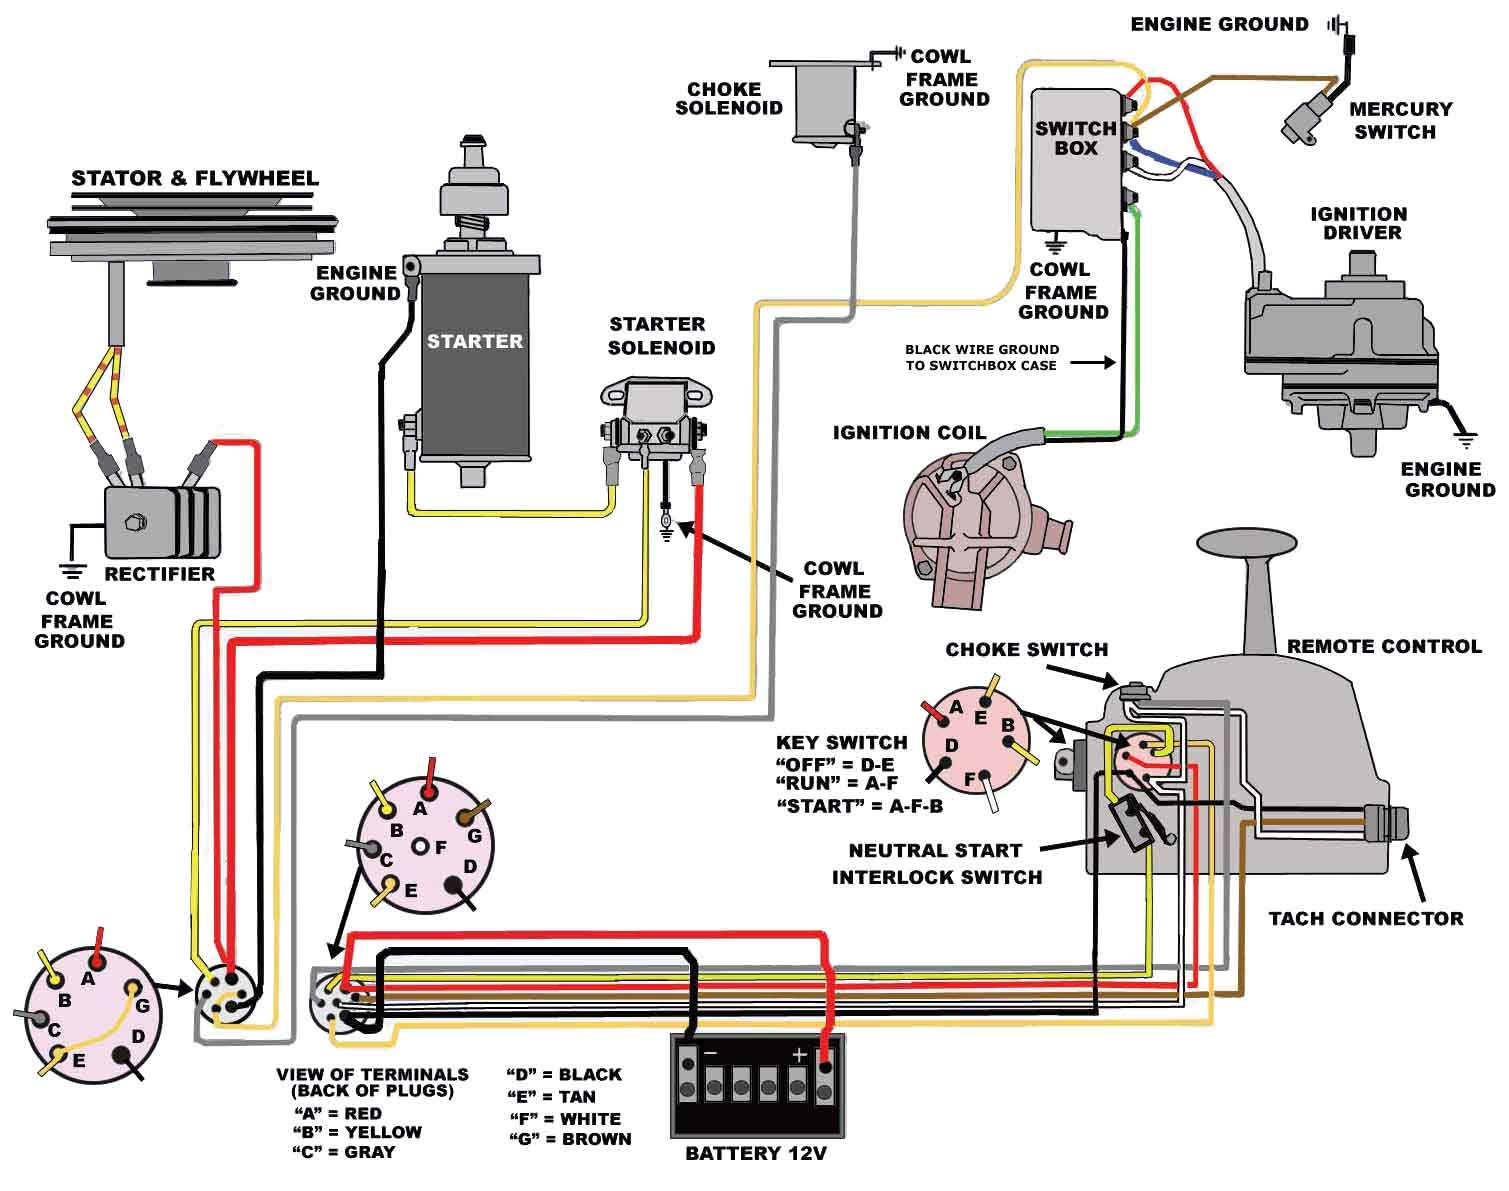 Mercury outboard wiring diagram diagram pinterest mercury outboard